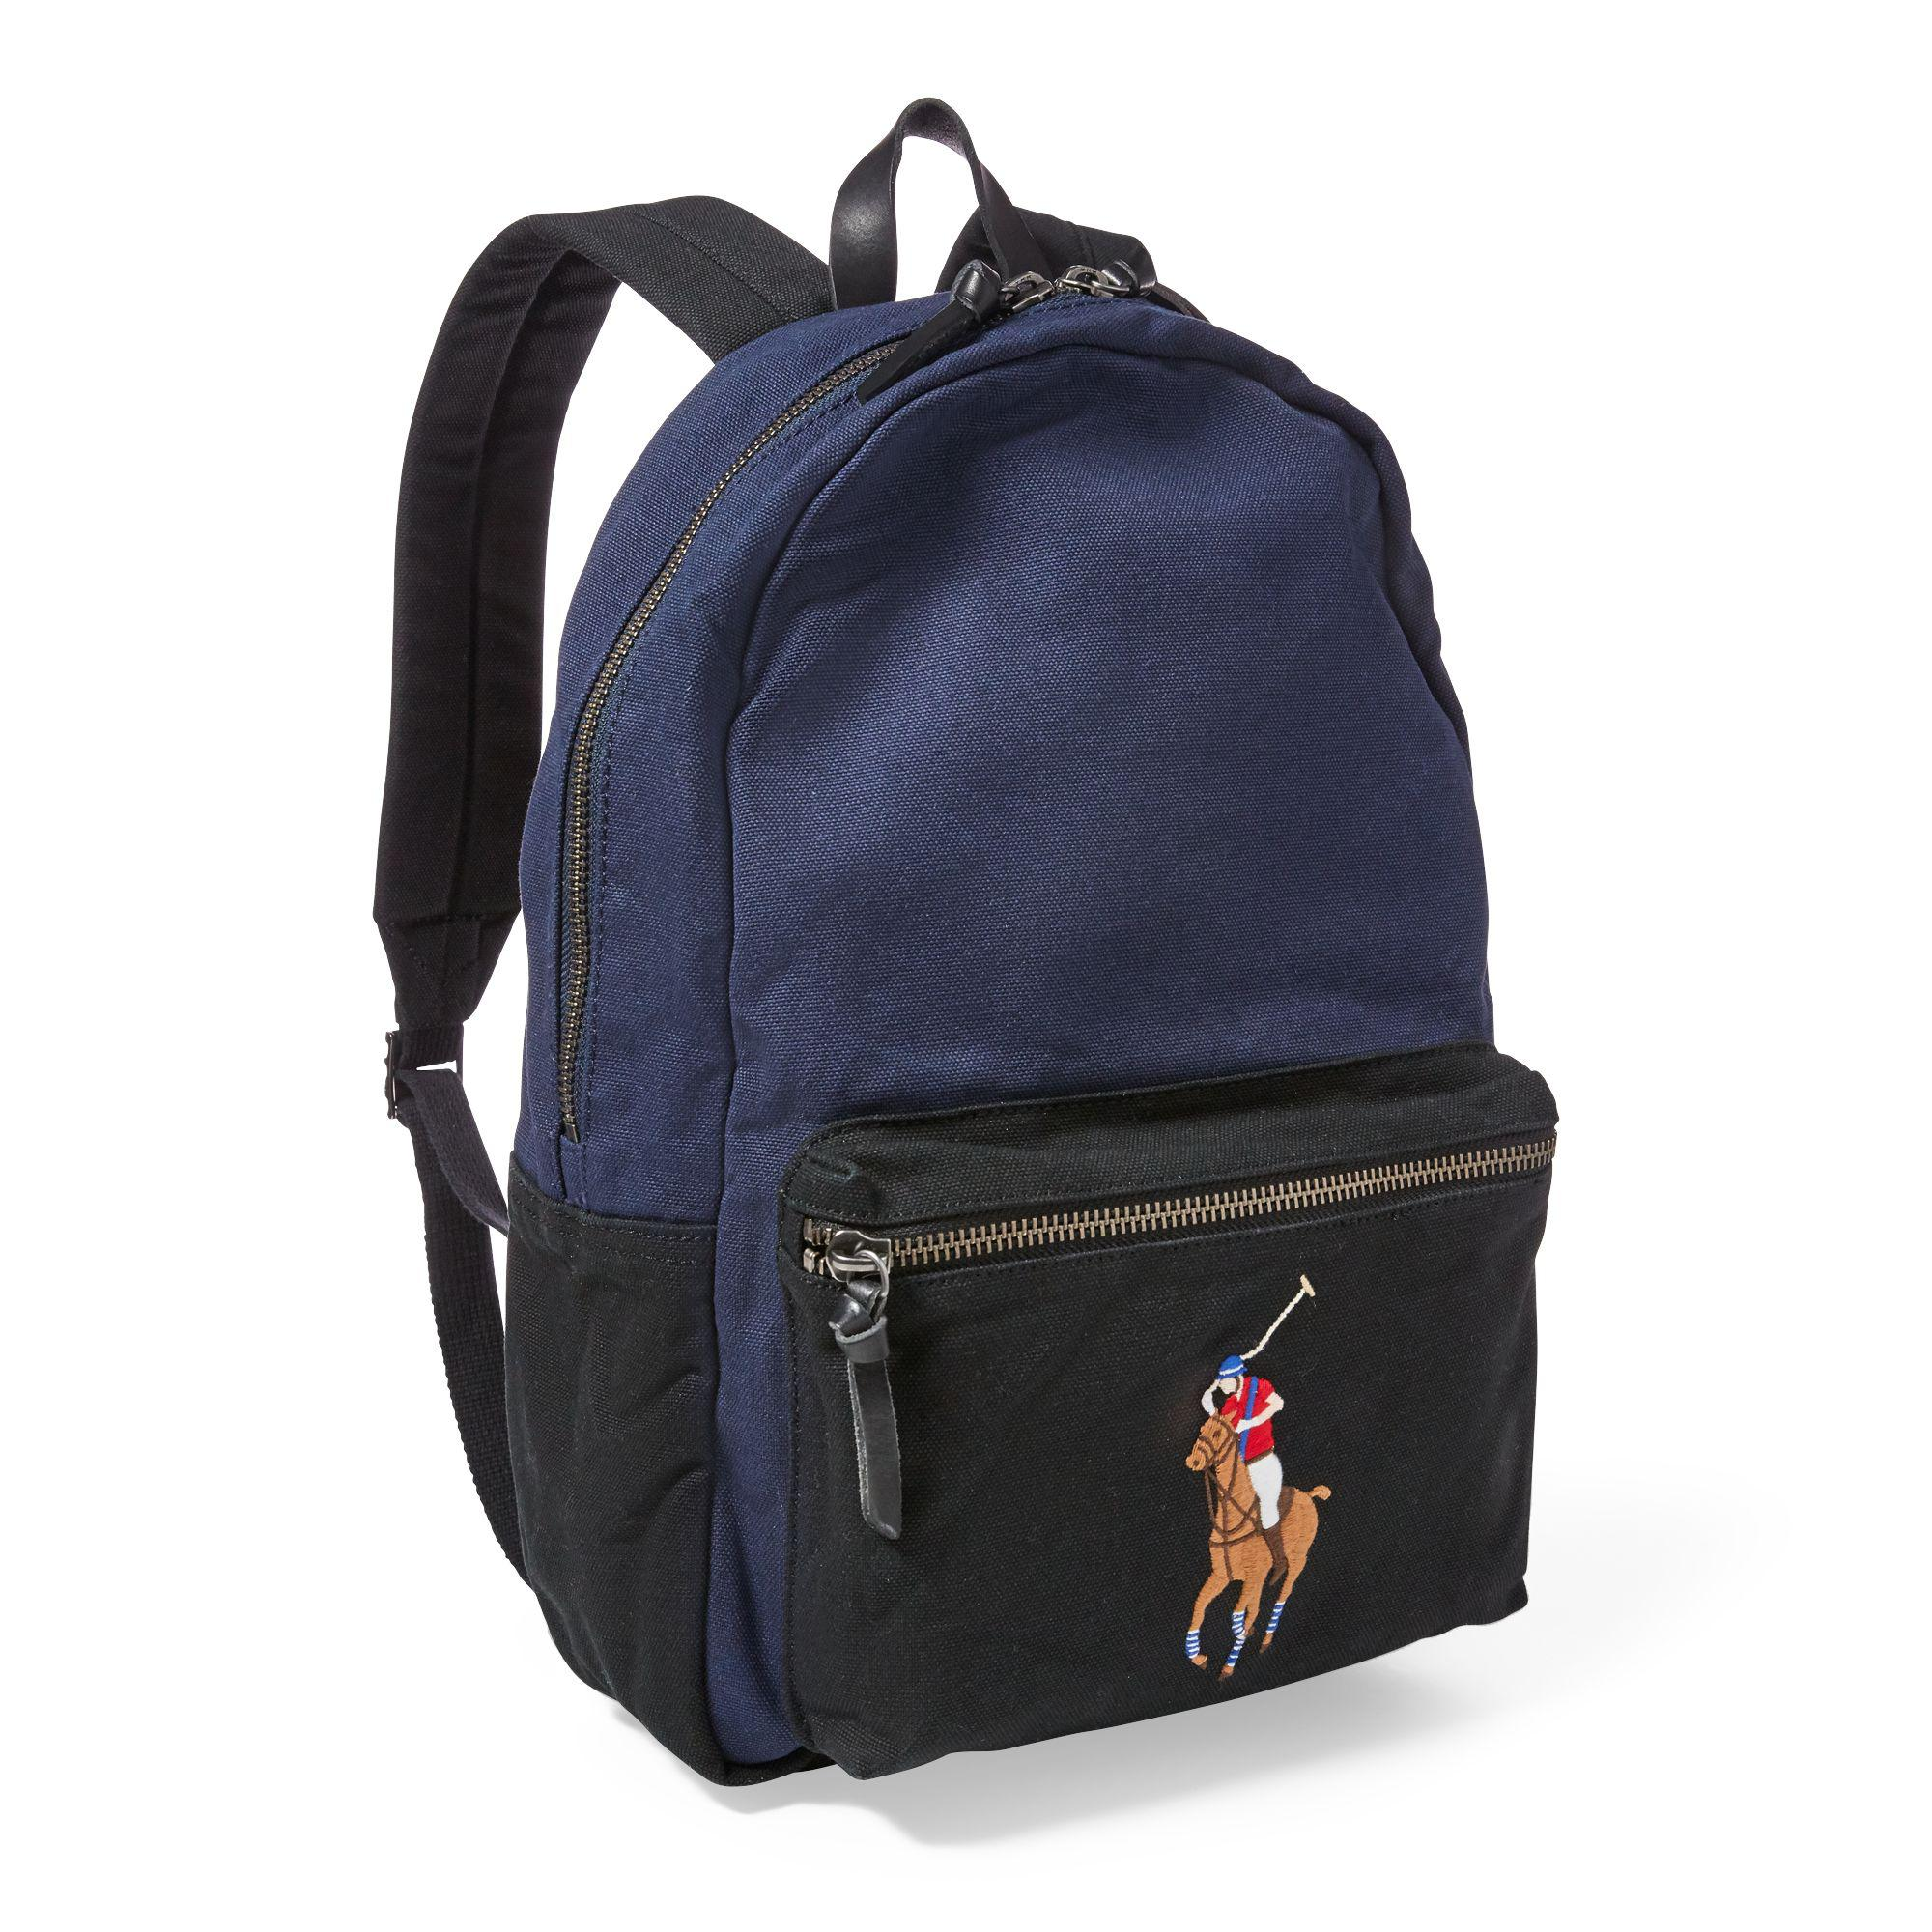 Polo Ralph Lauren Canvas Big Pony Backpack for Men - Lyst c8be95461c9da